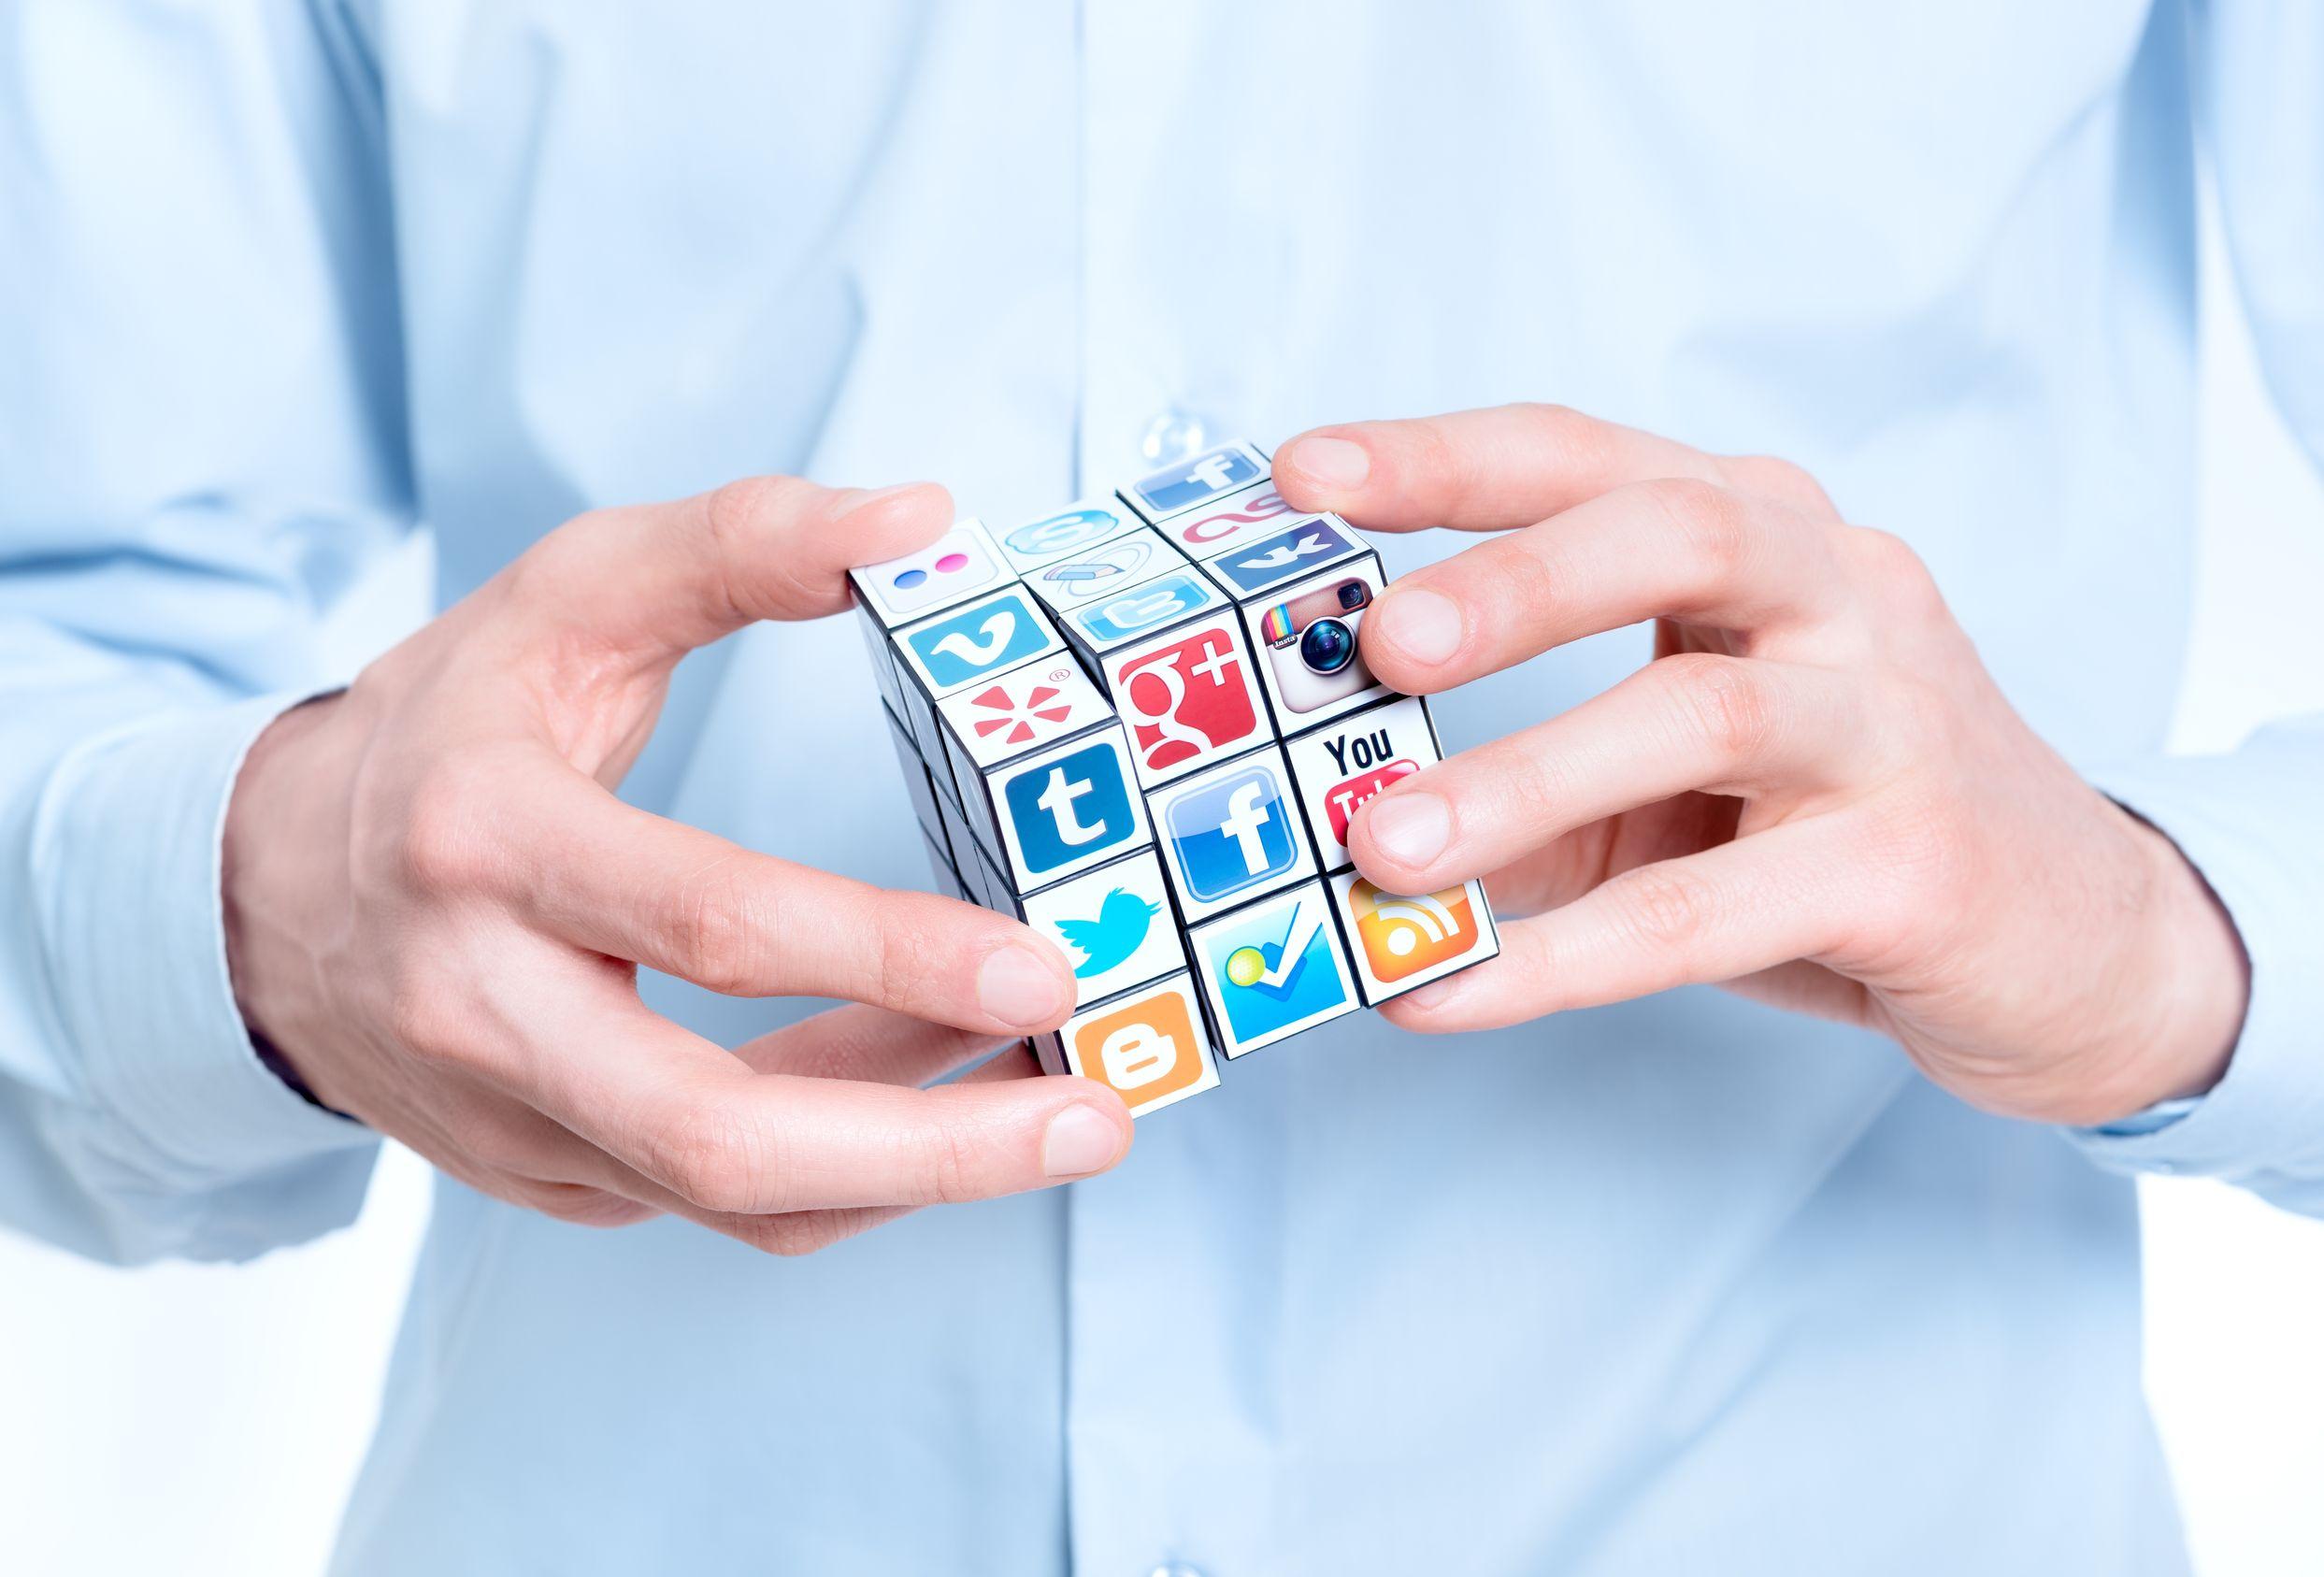 socialblade helps in youtube analysis